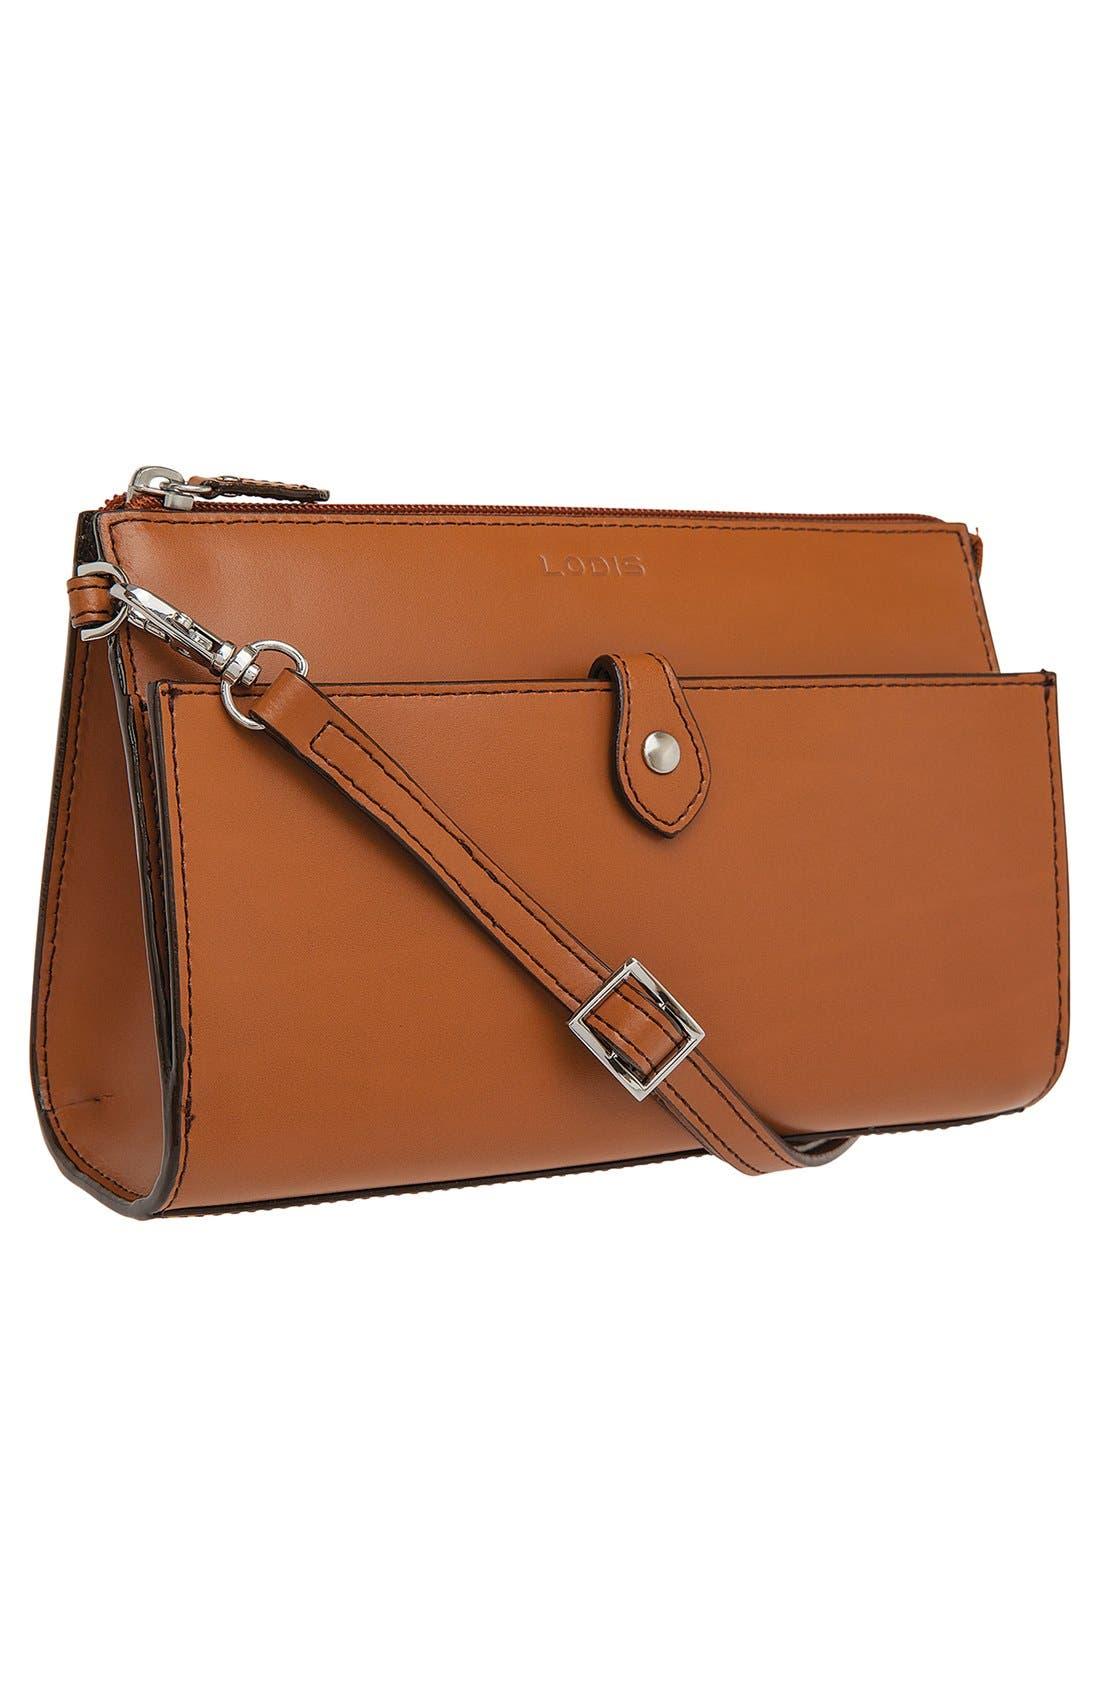 Lodis'Audrey Collection -Vicky' ConvertibleCrossbody Bag,                             Alternate thumbnail 10, color,